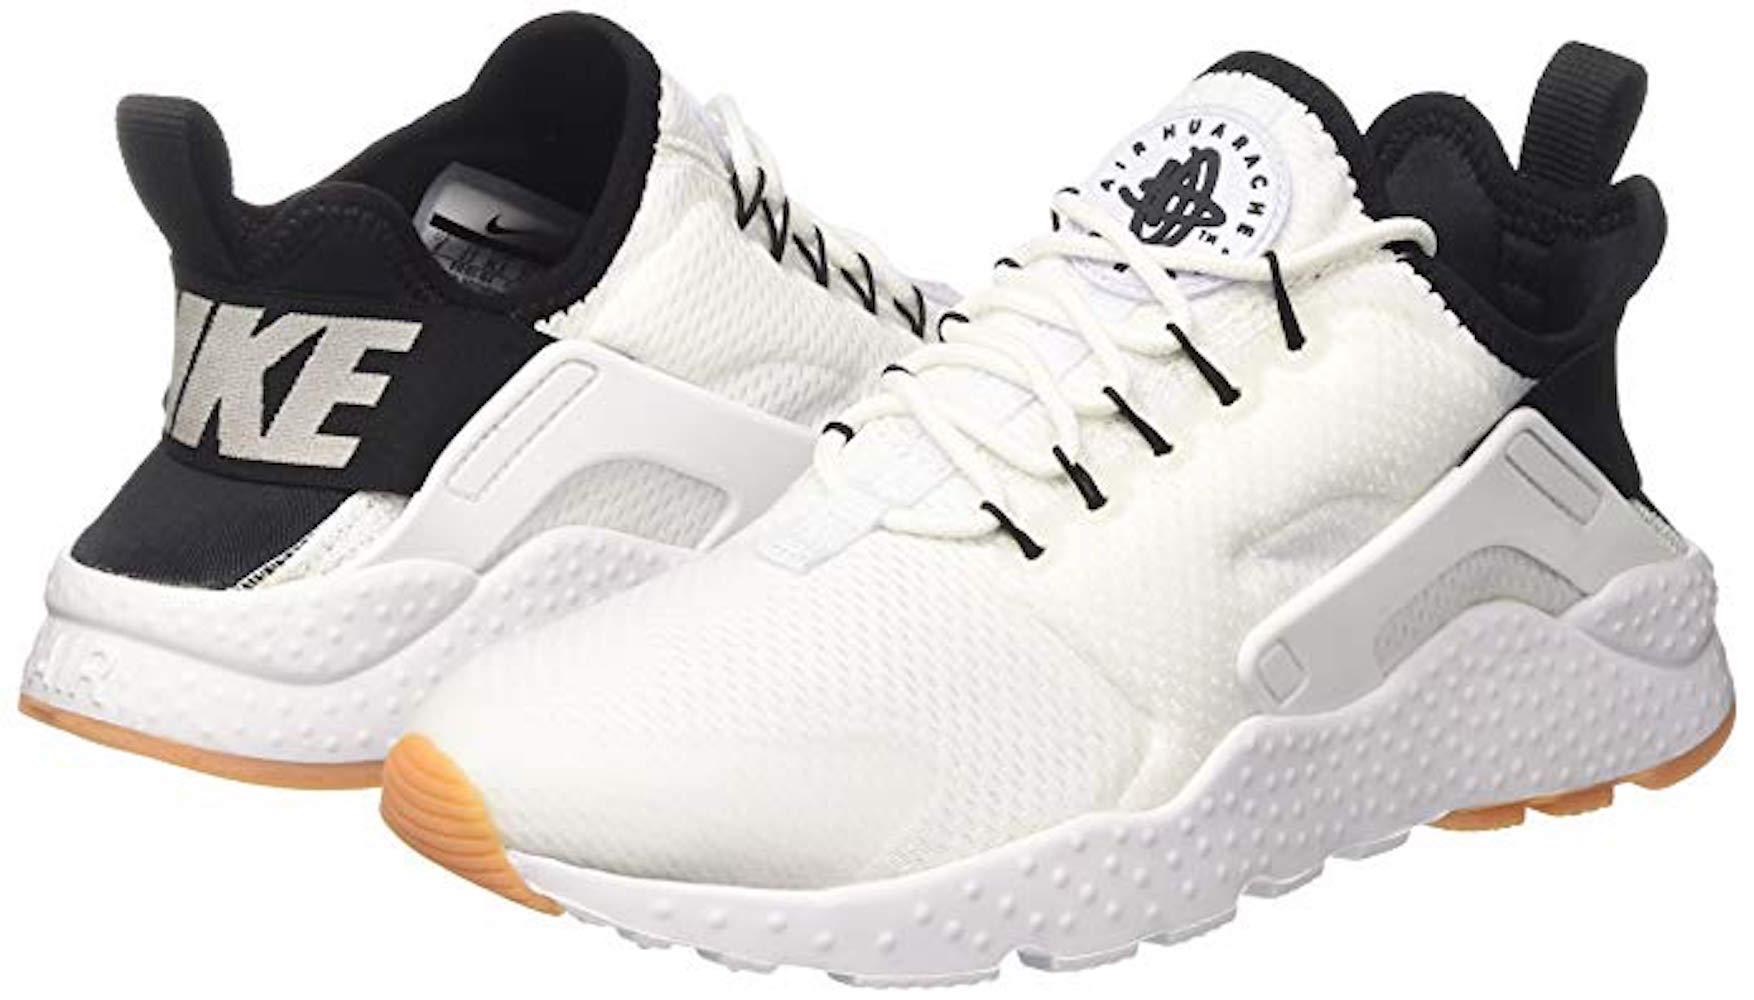 new arrivals 24c83 02630 Nike Womens Air Huarache Run prm Low Top, White Black-Gum Yellow-White,  Size 9.5